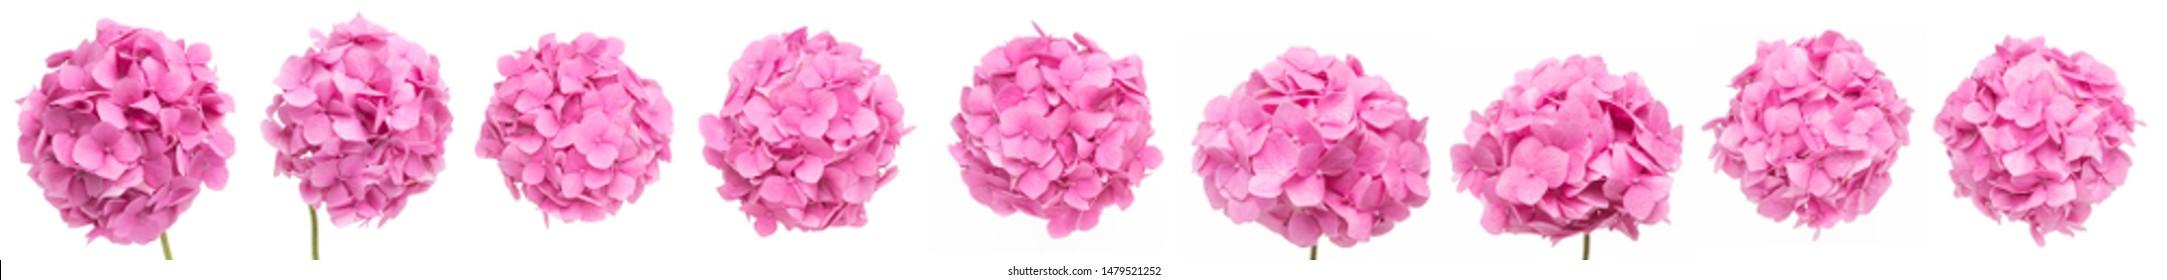 Pink Hydrangea flowers isolated on white background, Blooming branch of Hortensia pink flower head, Bouquet of pink hydrangea flower garden bush